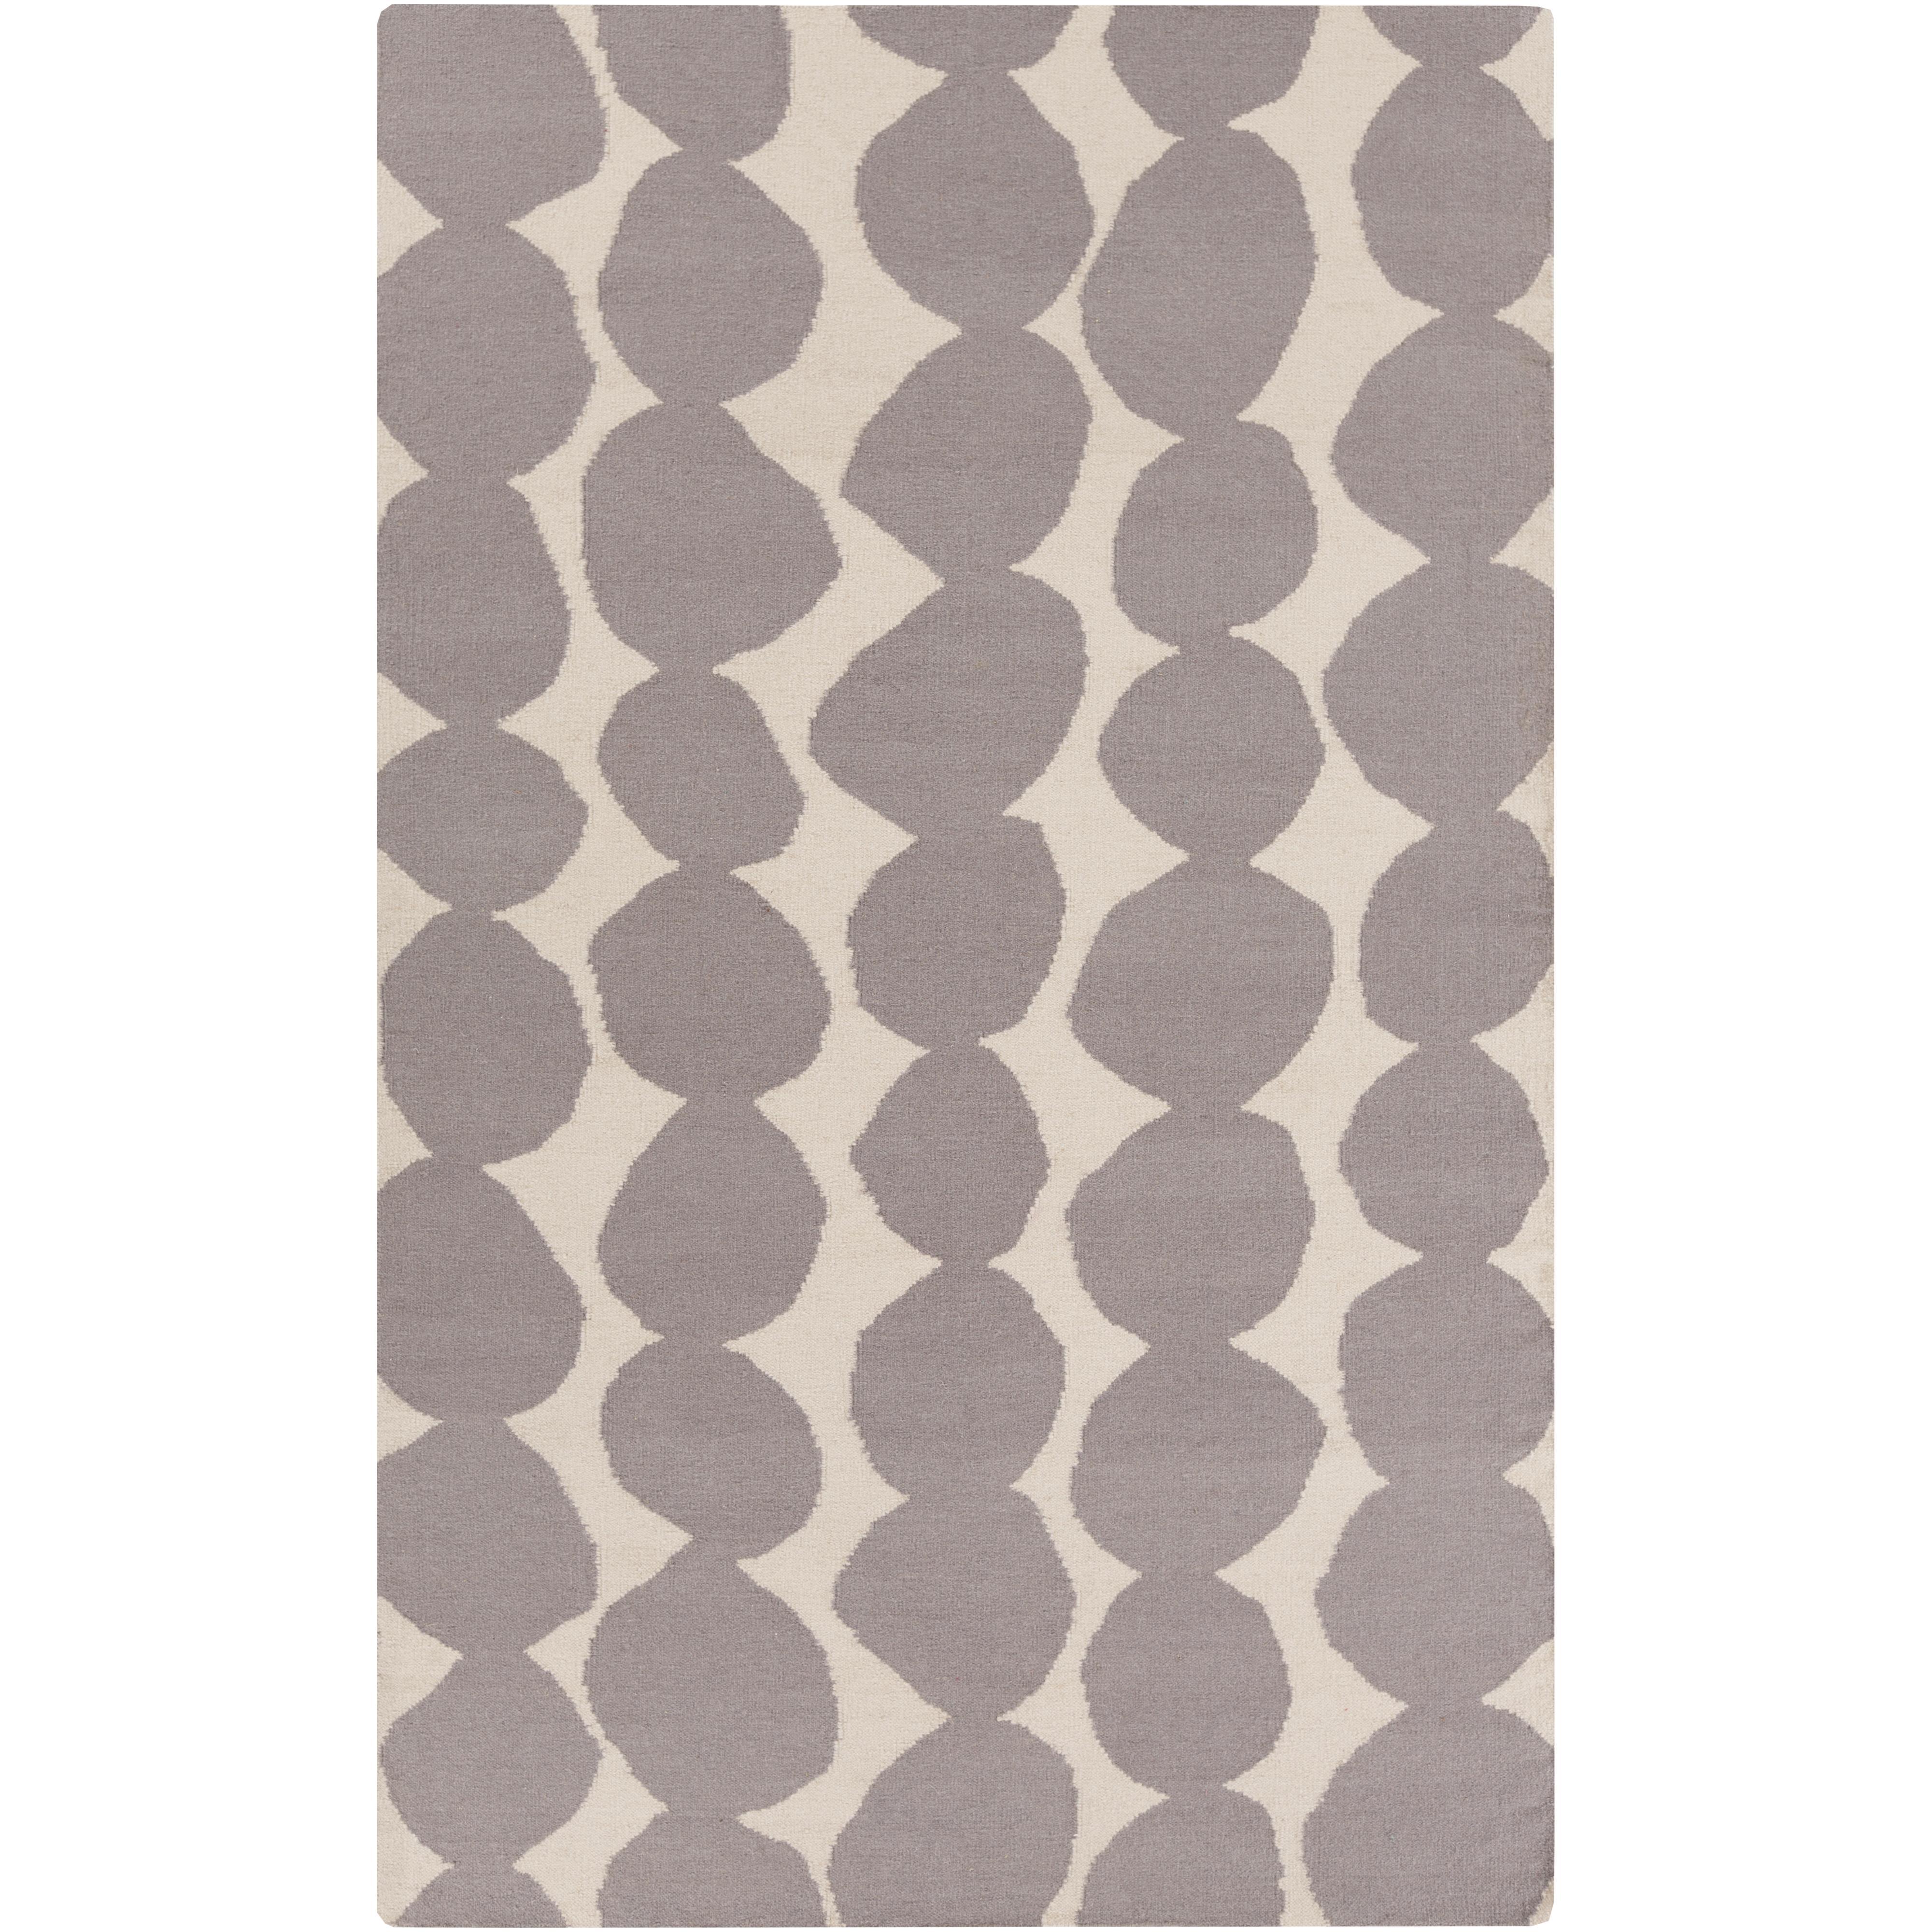 Surya Rugs Textila 8' x 11' - Item Number: TXT3009-811